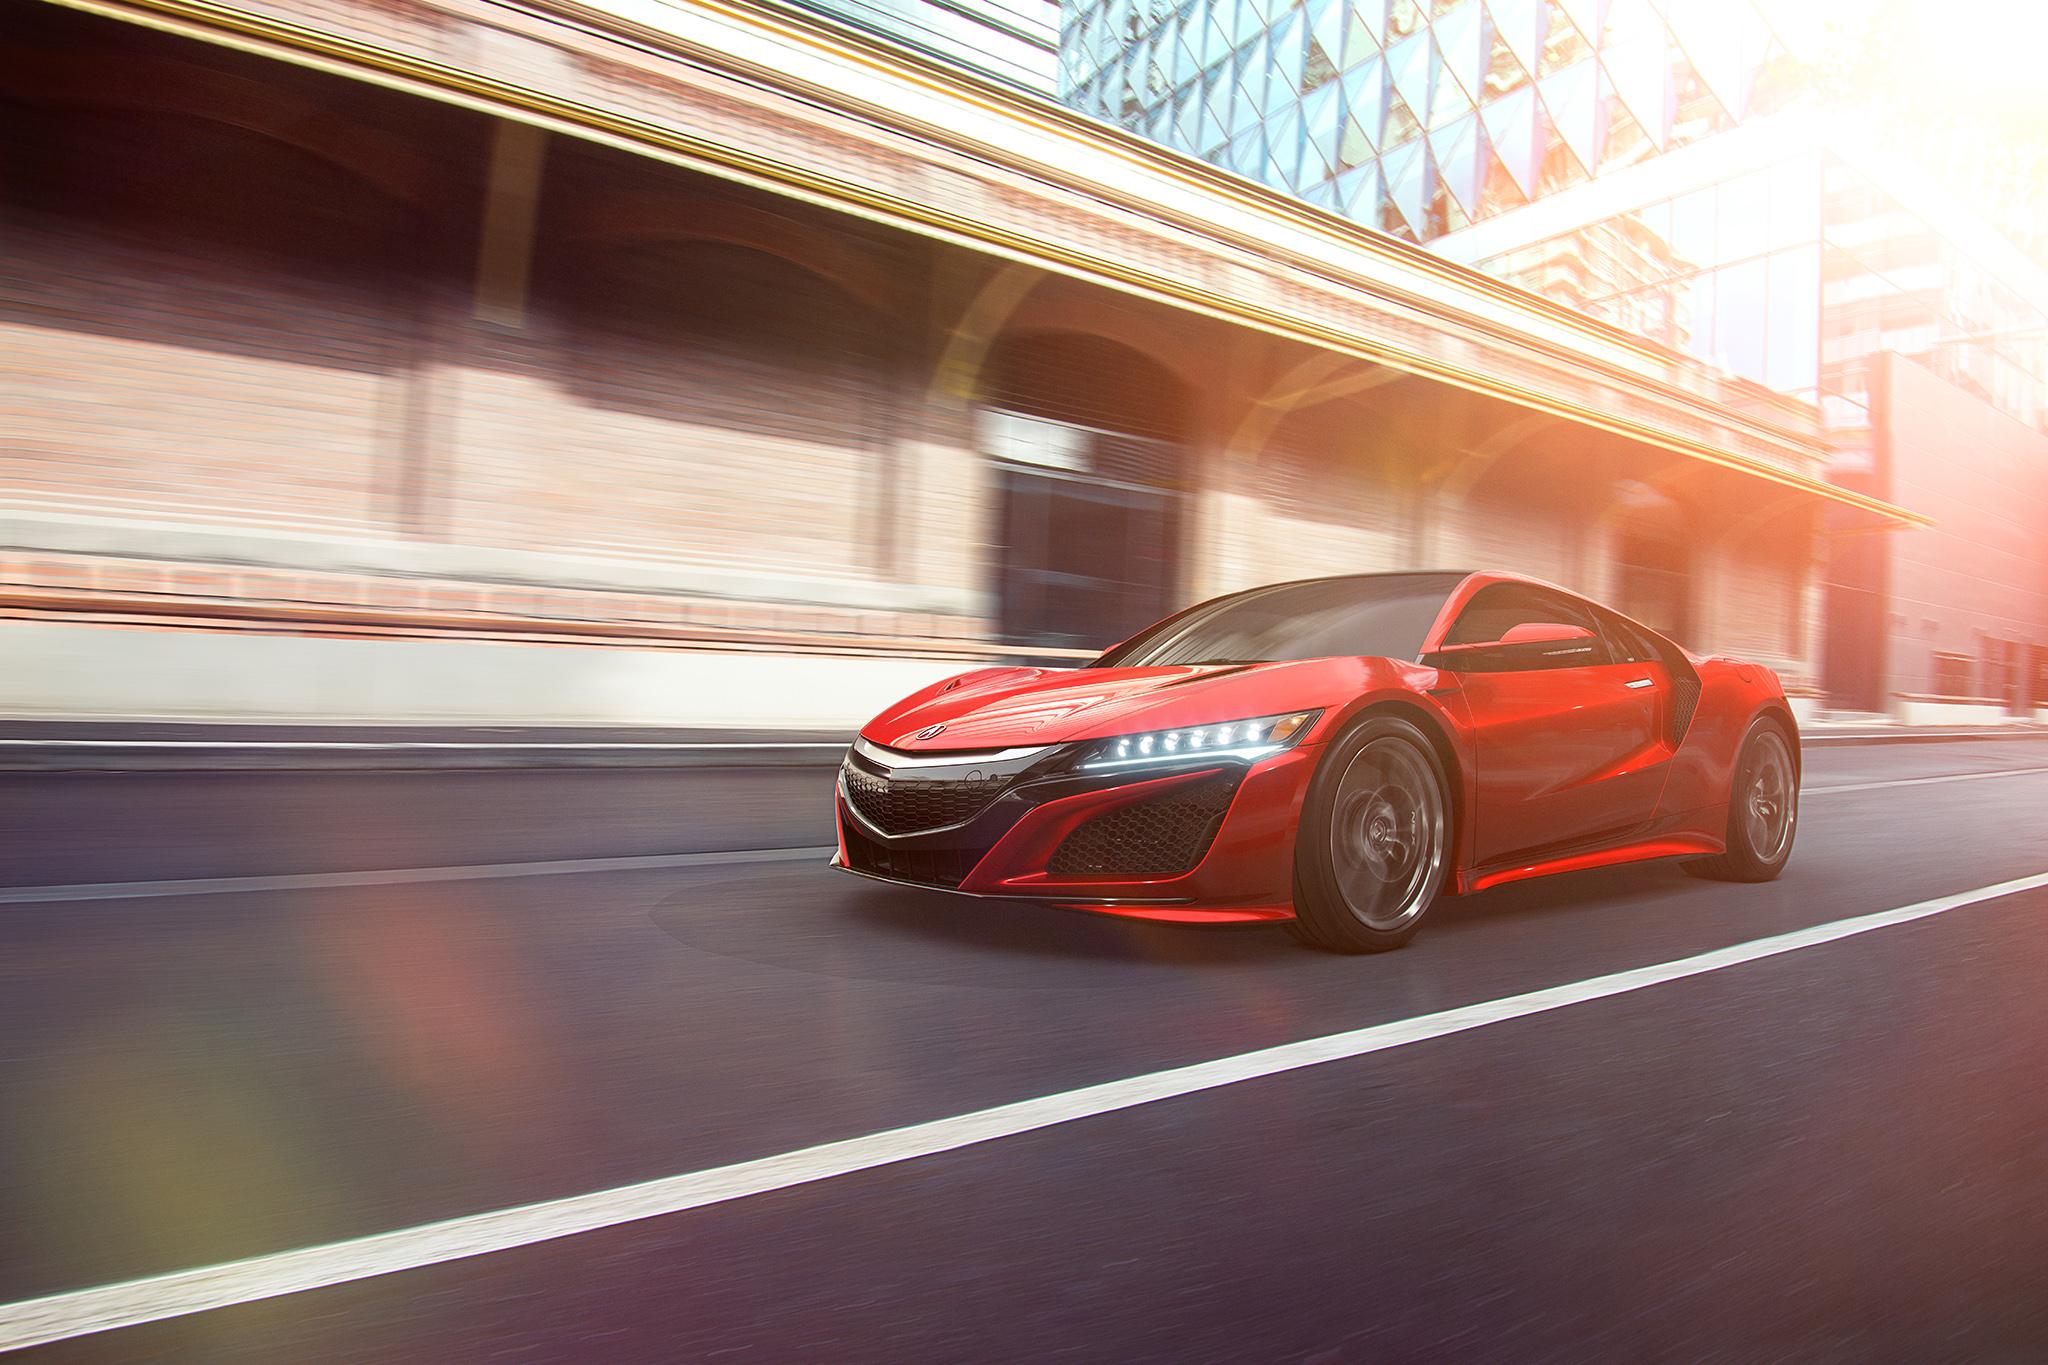 Acura NSX - CGI